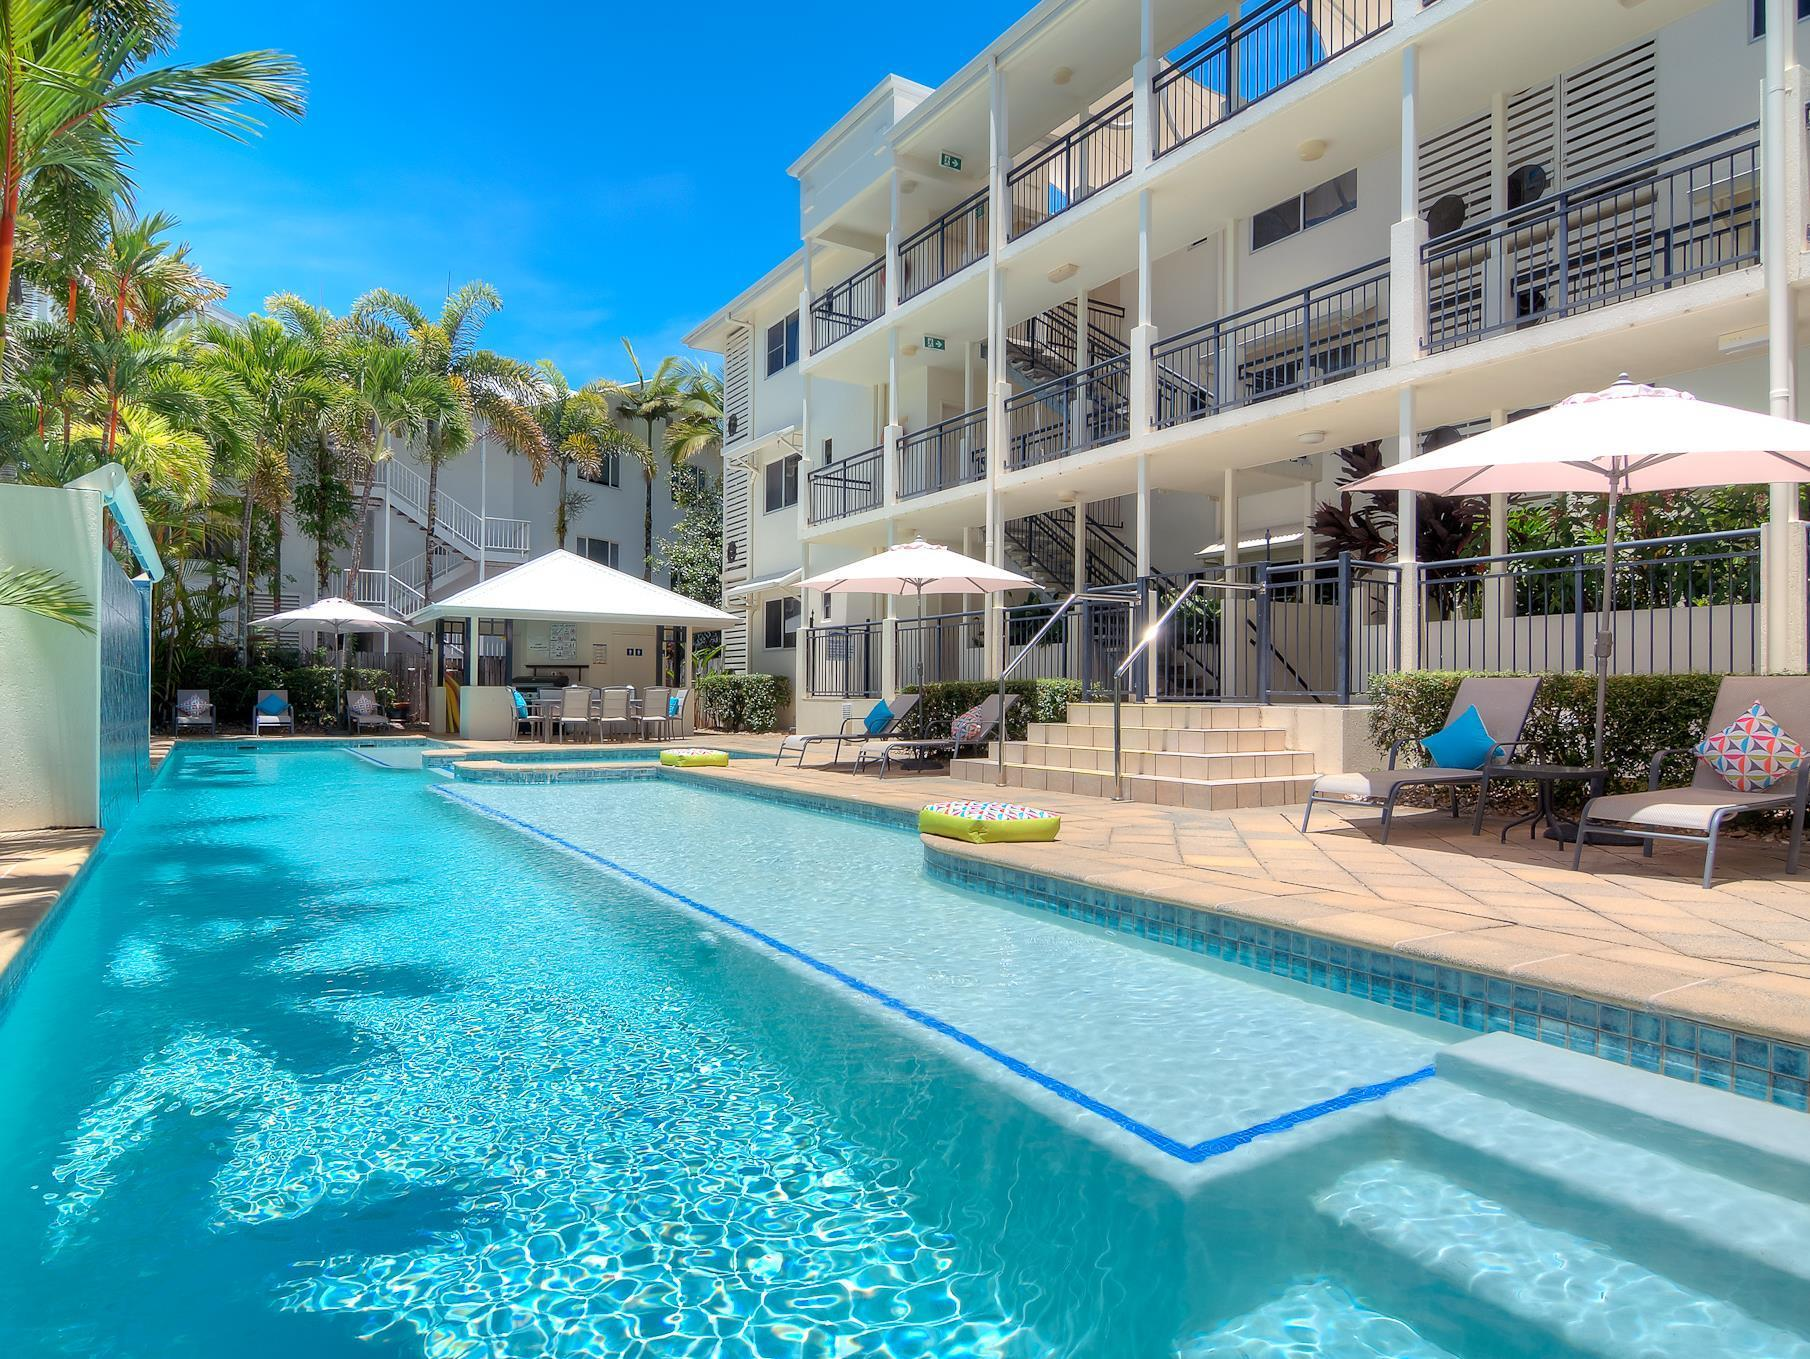 Latitude 16 Mowbray by the Sea Apartments - Hotell och Boende i Australien , Port Douglas